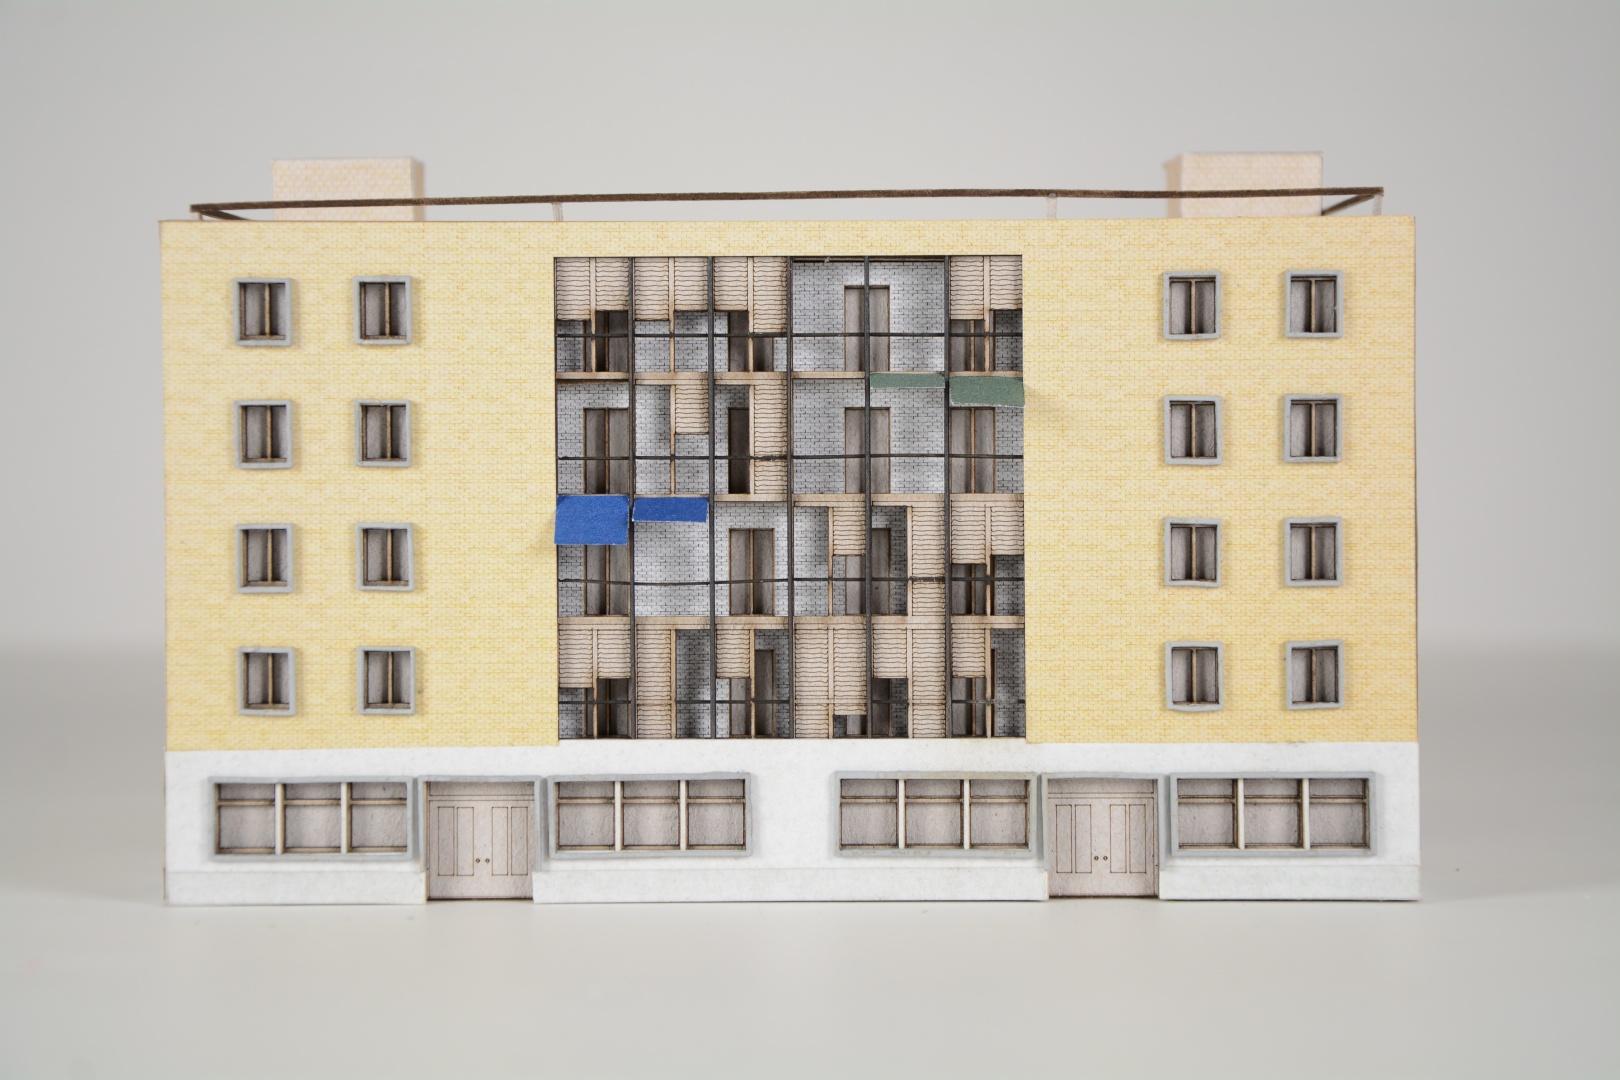 Fassadenmodell Bau Nord © Craveiro / Zahler